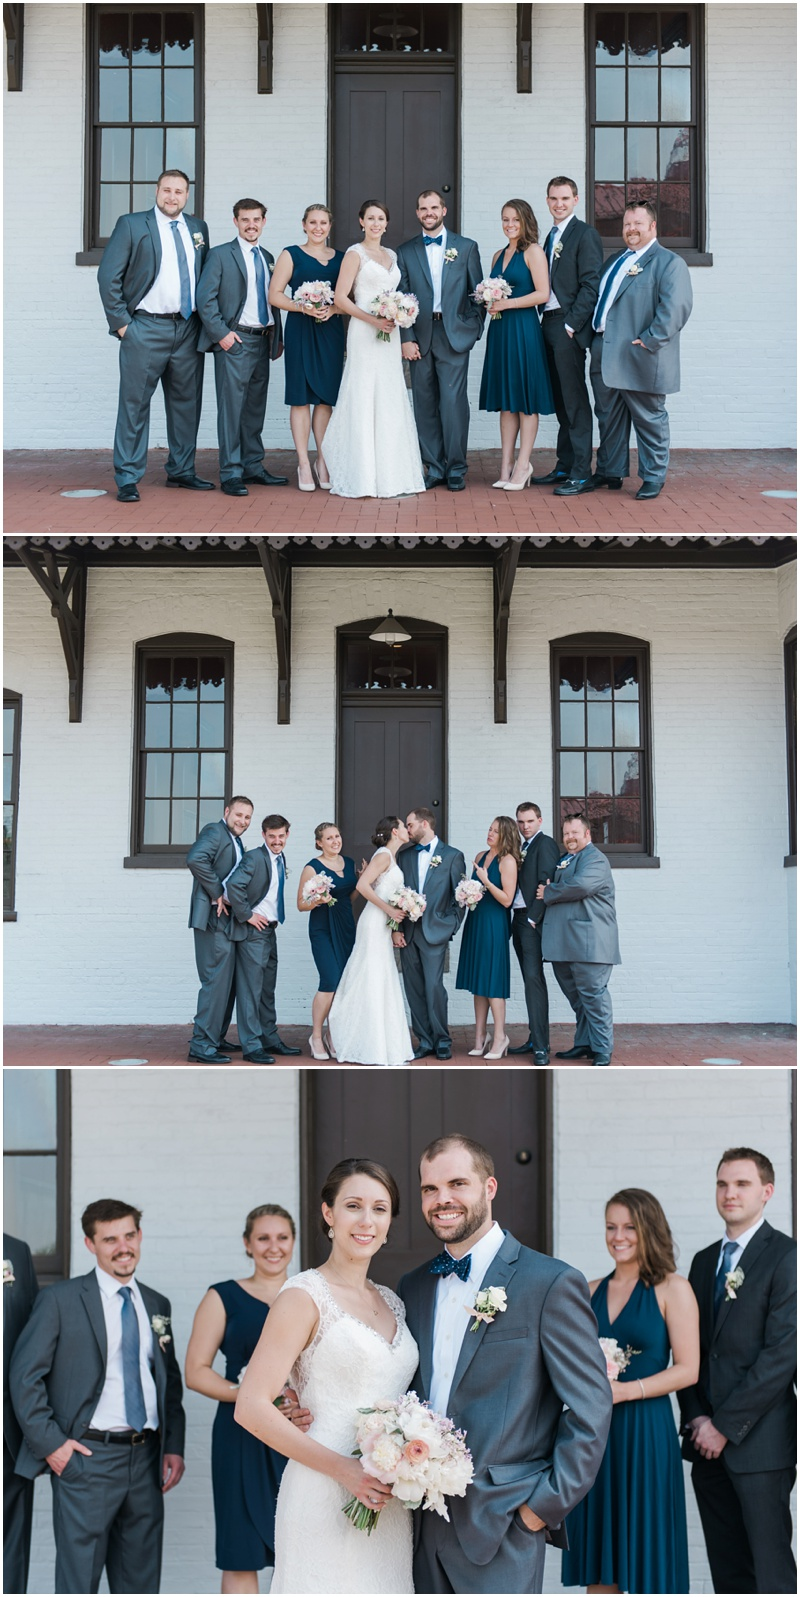 Mccoy-Emmett Wedding-160.JPG